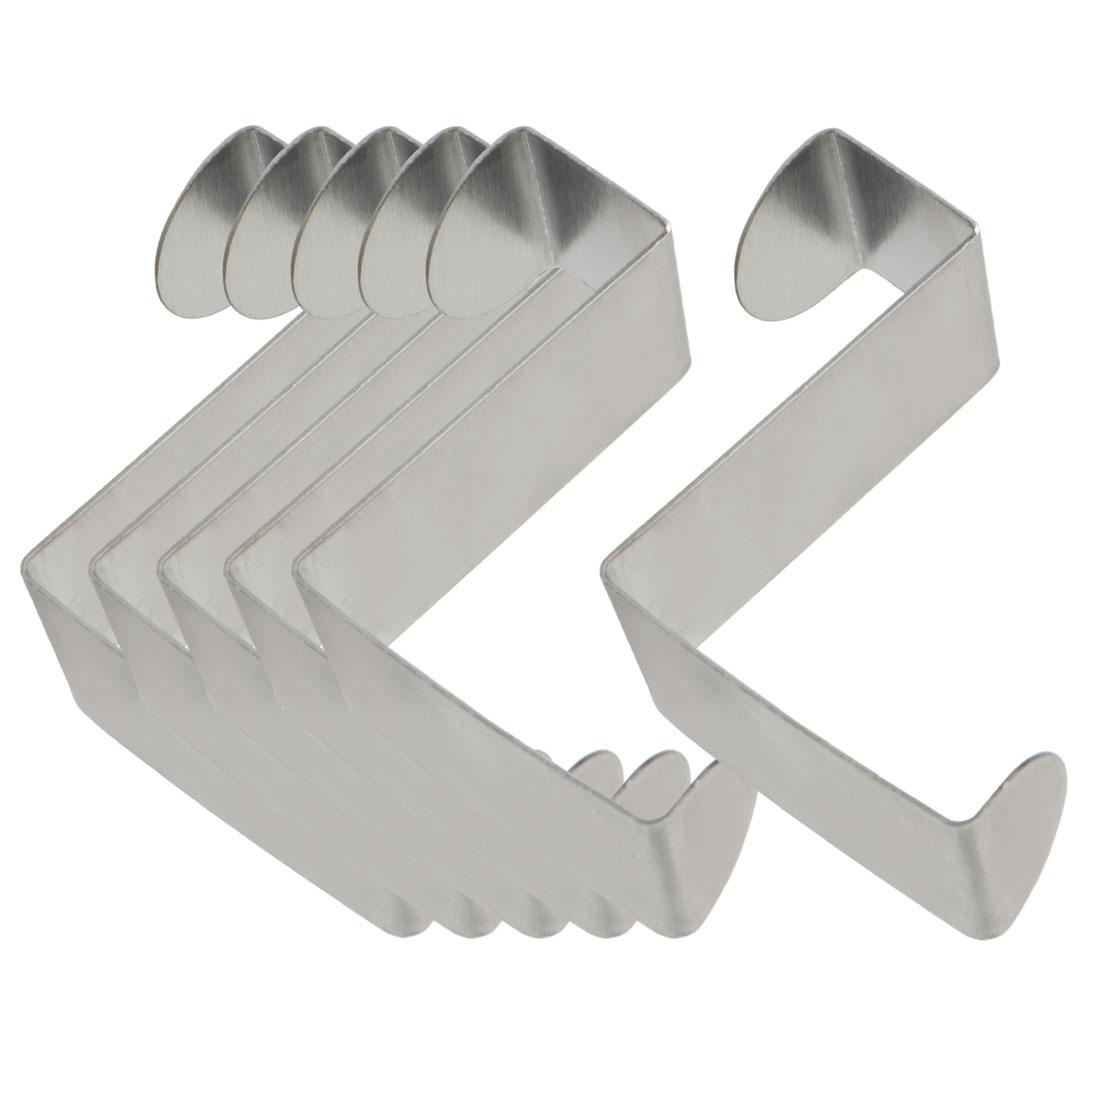 6pcs Z Shaped Hook Stainless Steel for Kitchenware Pot Utensils Coat Holders